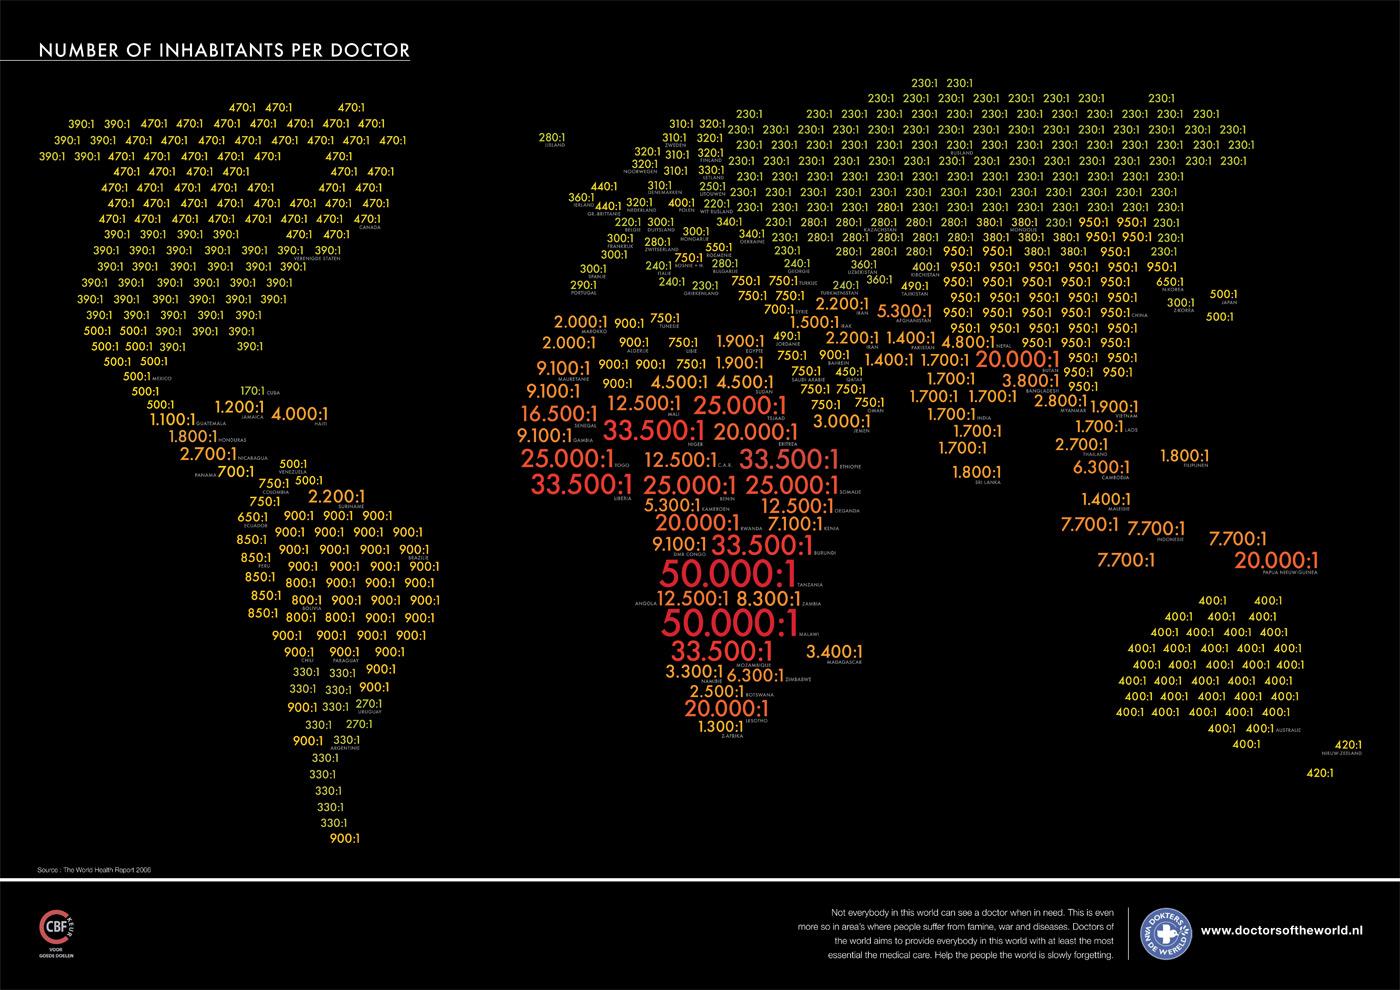 http://3.bp.blogspot.com/_r9wx8eFfx24/SxMv7hsrMwI/AAAAAAAABQ0/syrSuGi67vU/s1600/nombre+de+m%C3%A9decins+par+habitant+dans+le+monde.jpg